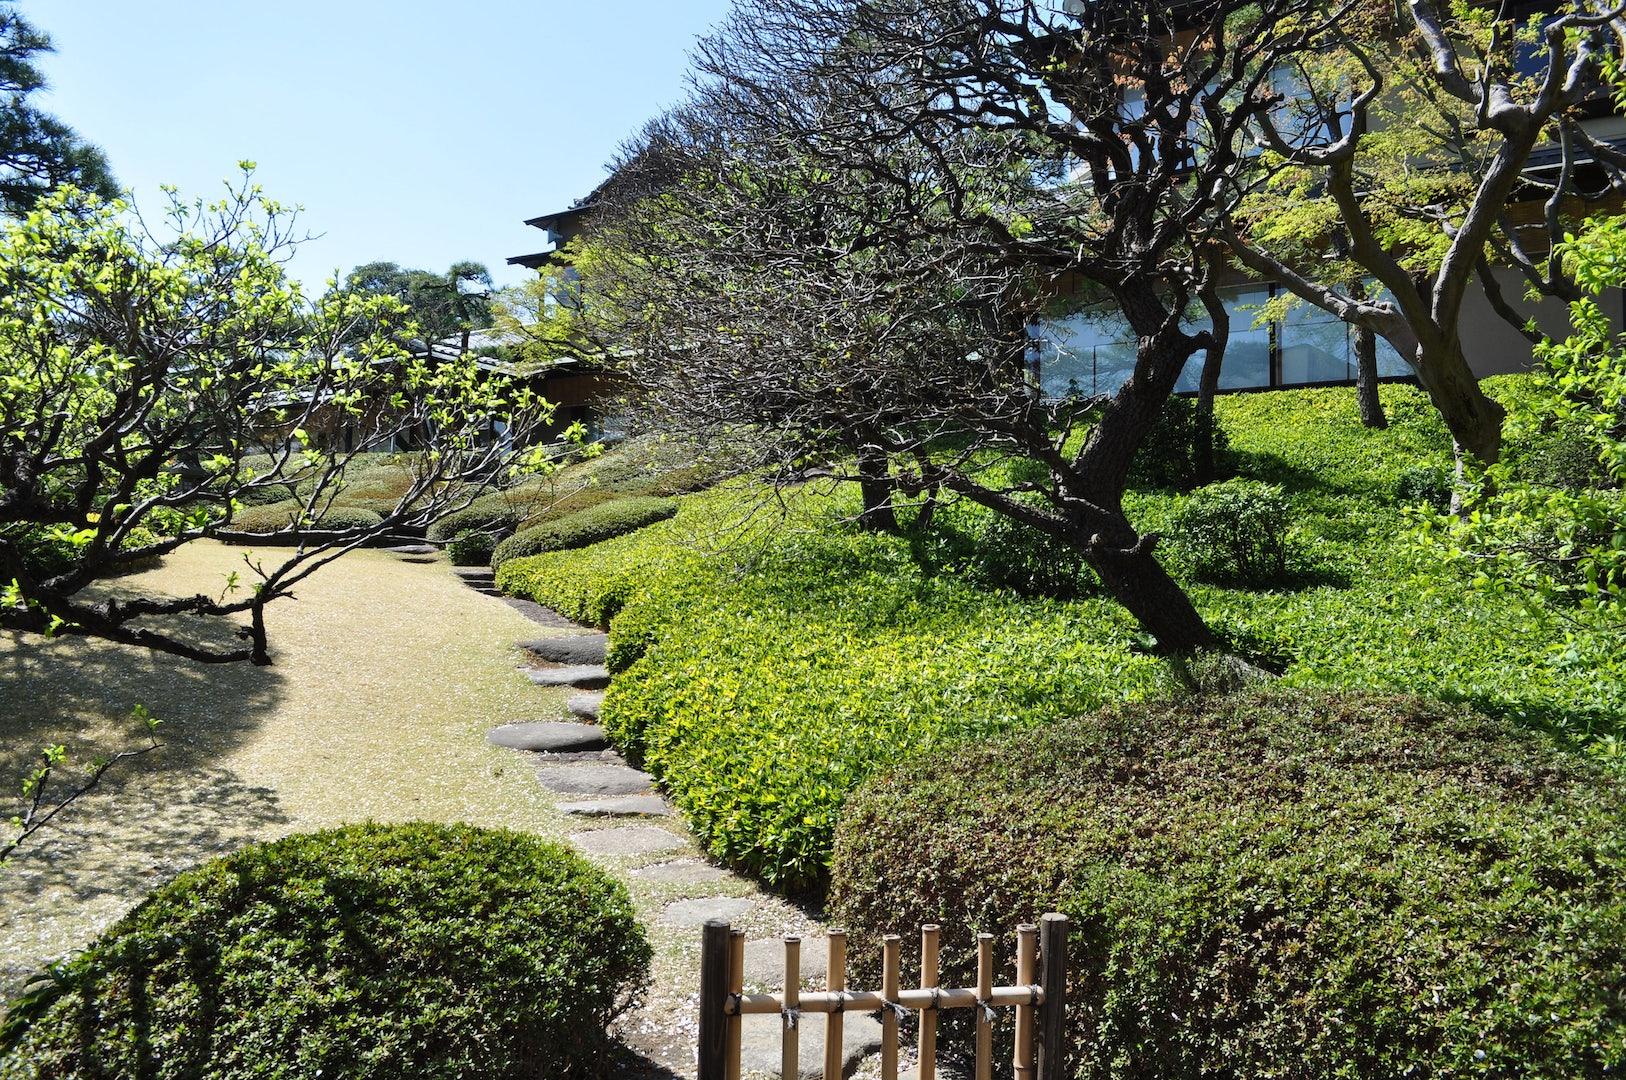 Happpo-en garden in Tokyo